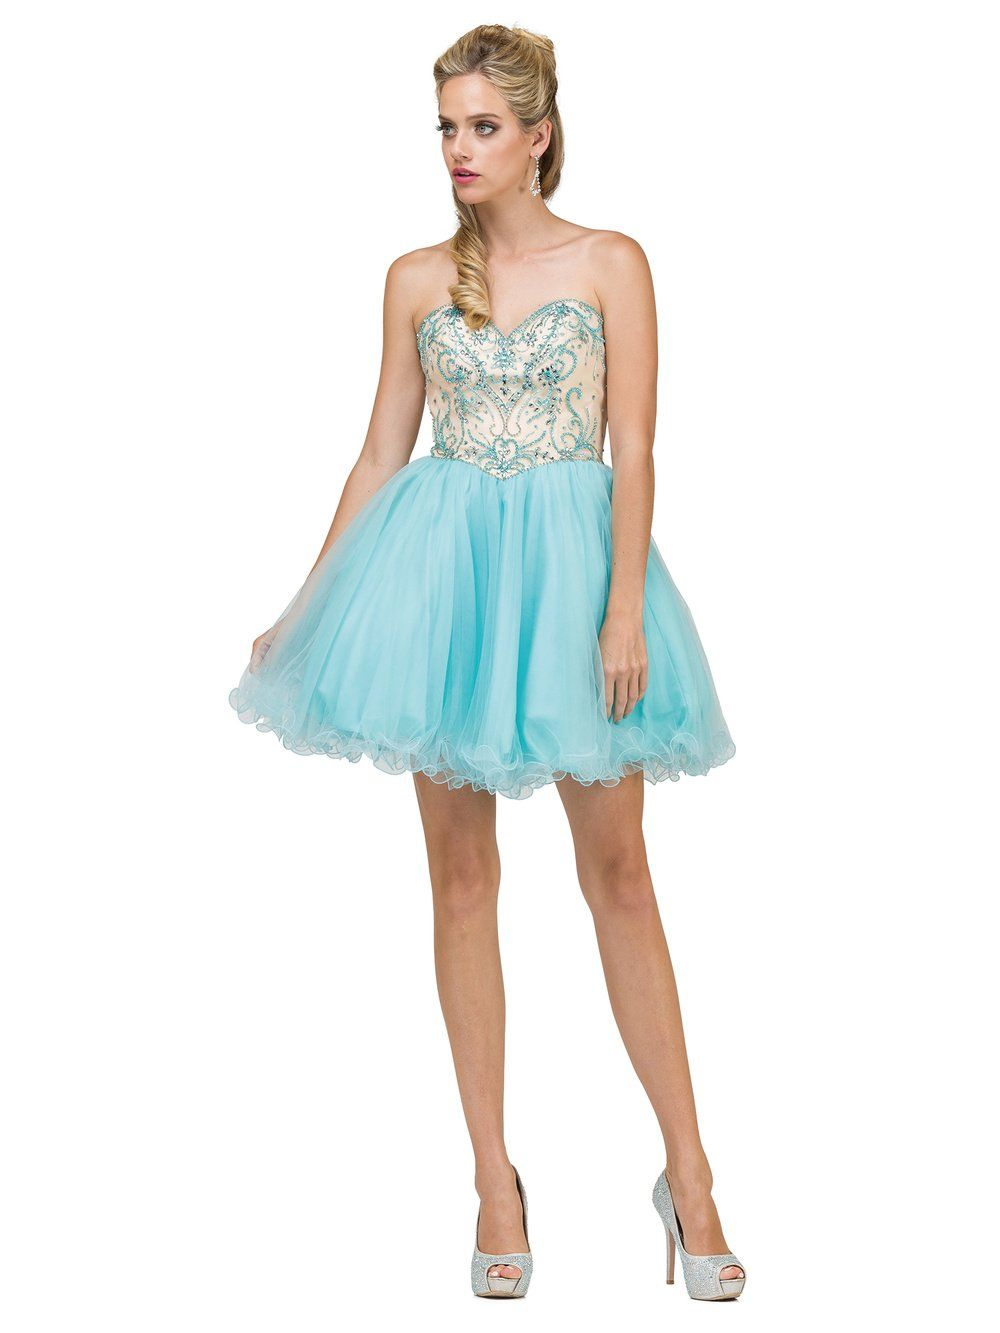 Dama Dress Style Quincedresses Com Dresses Dama Dresses Cocktail Dress [ 1333 x 1000 Pixel ]